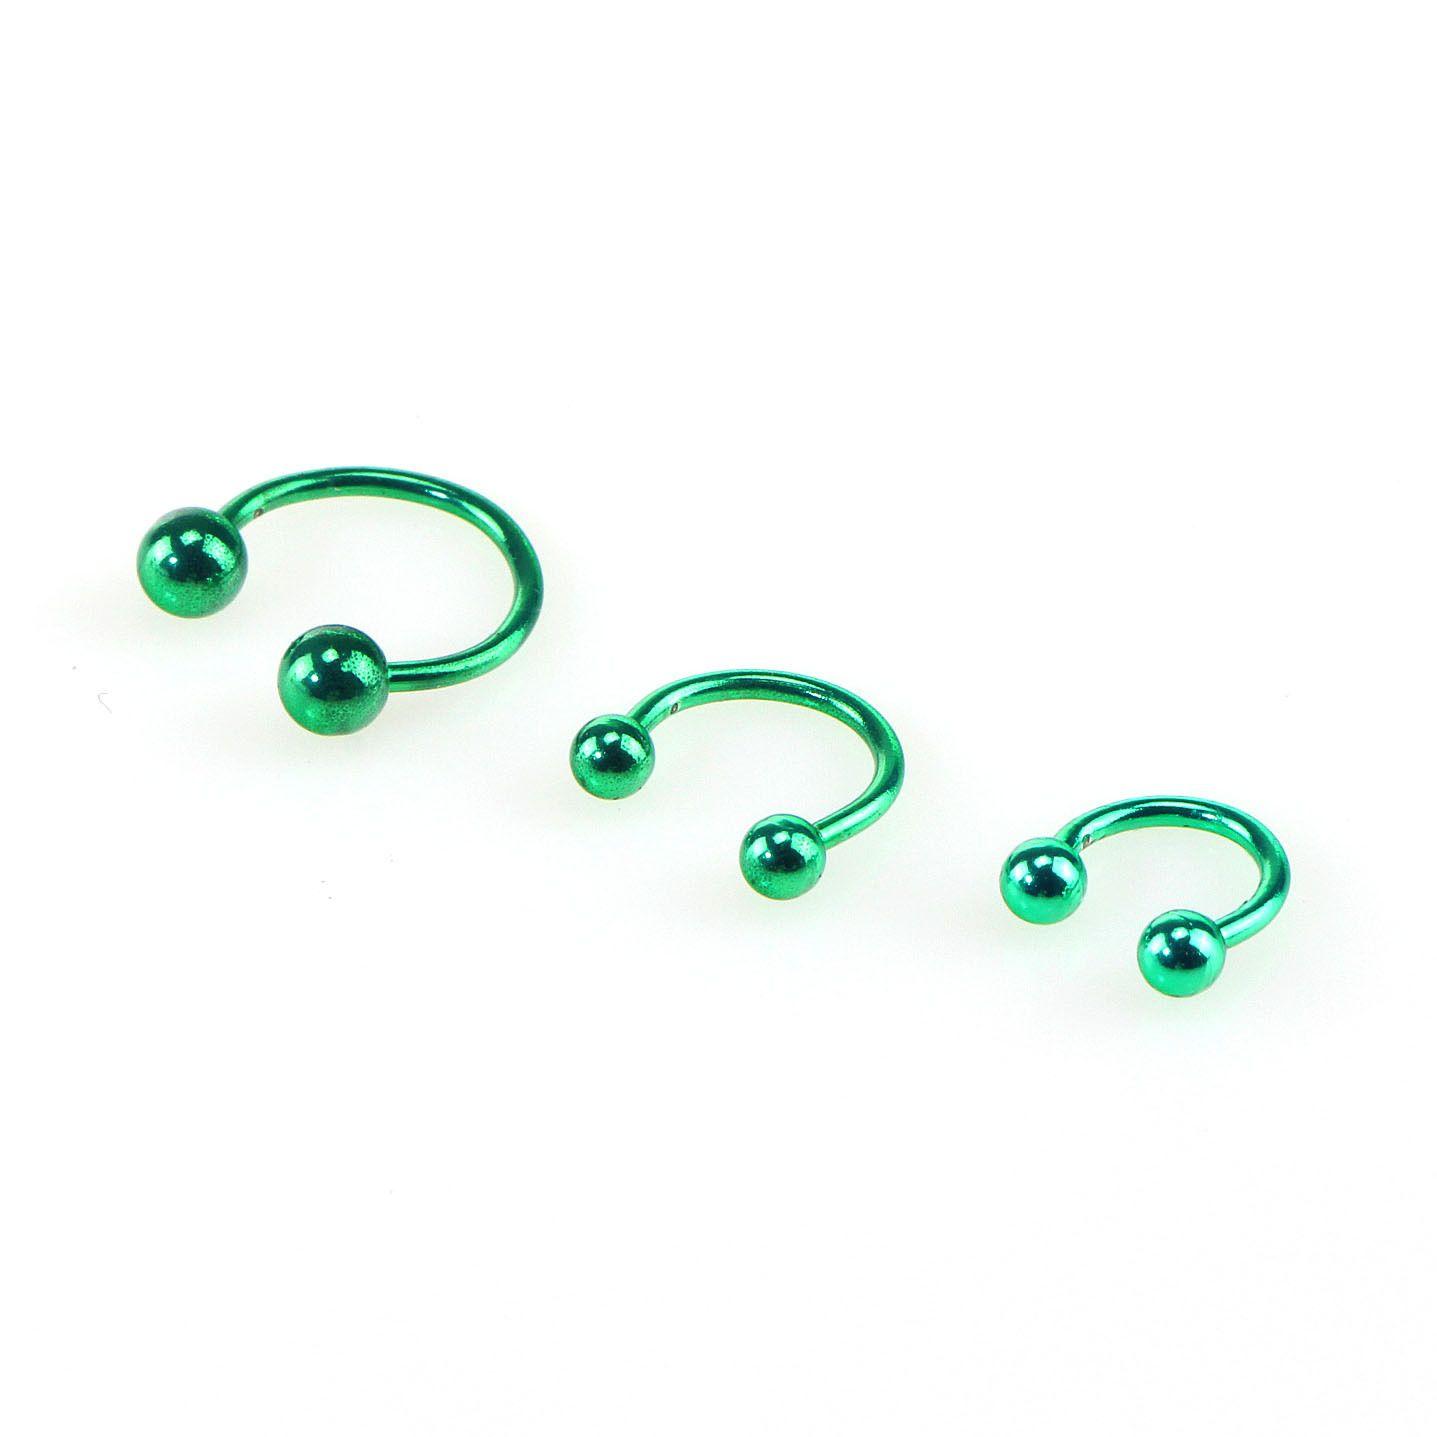 Nose Rings Body Piercing Jewelry Stainless Steel Nose Hoop Ring Earring Studs Bead Ring Ball Eyebrow Nipple Lip rings